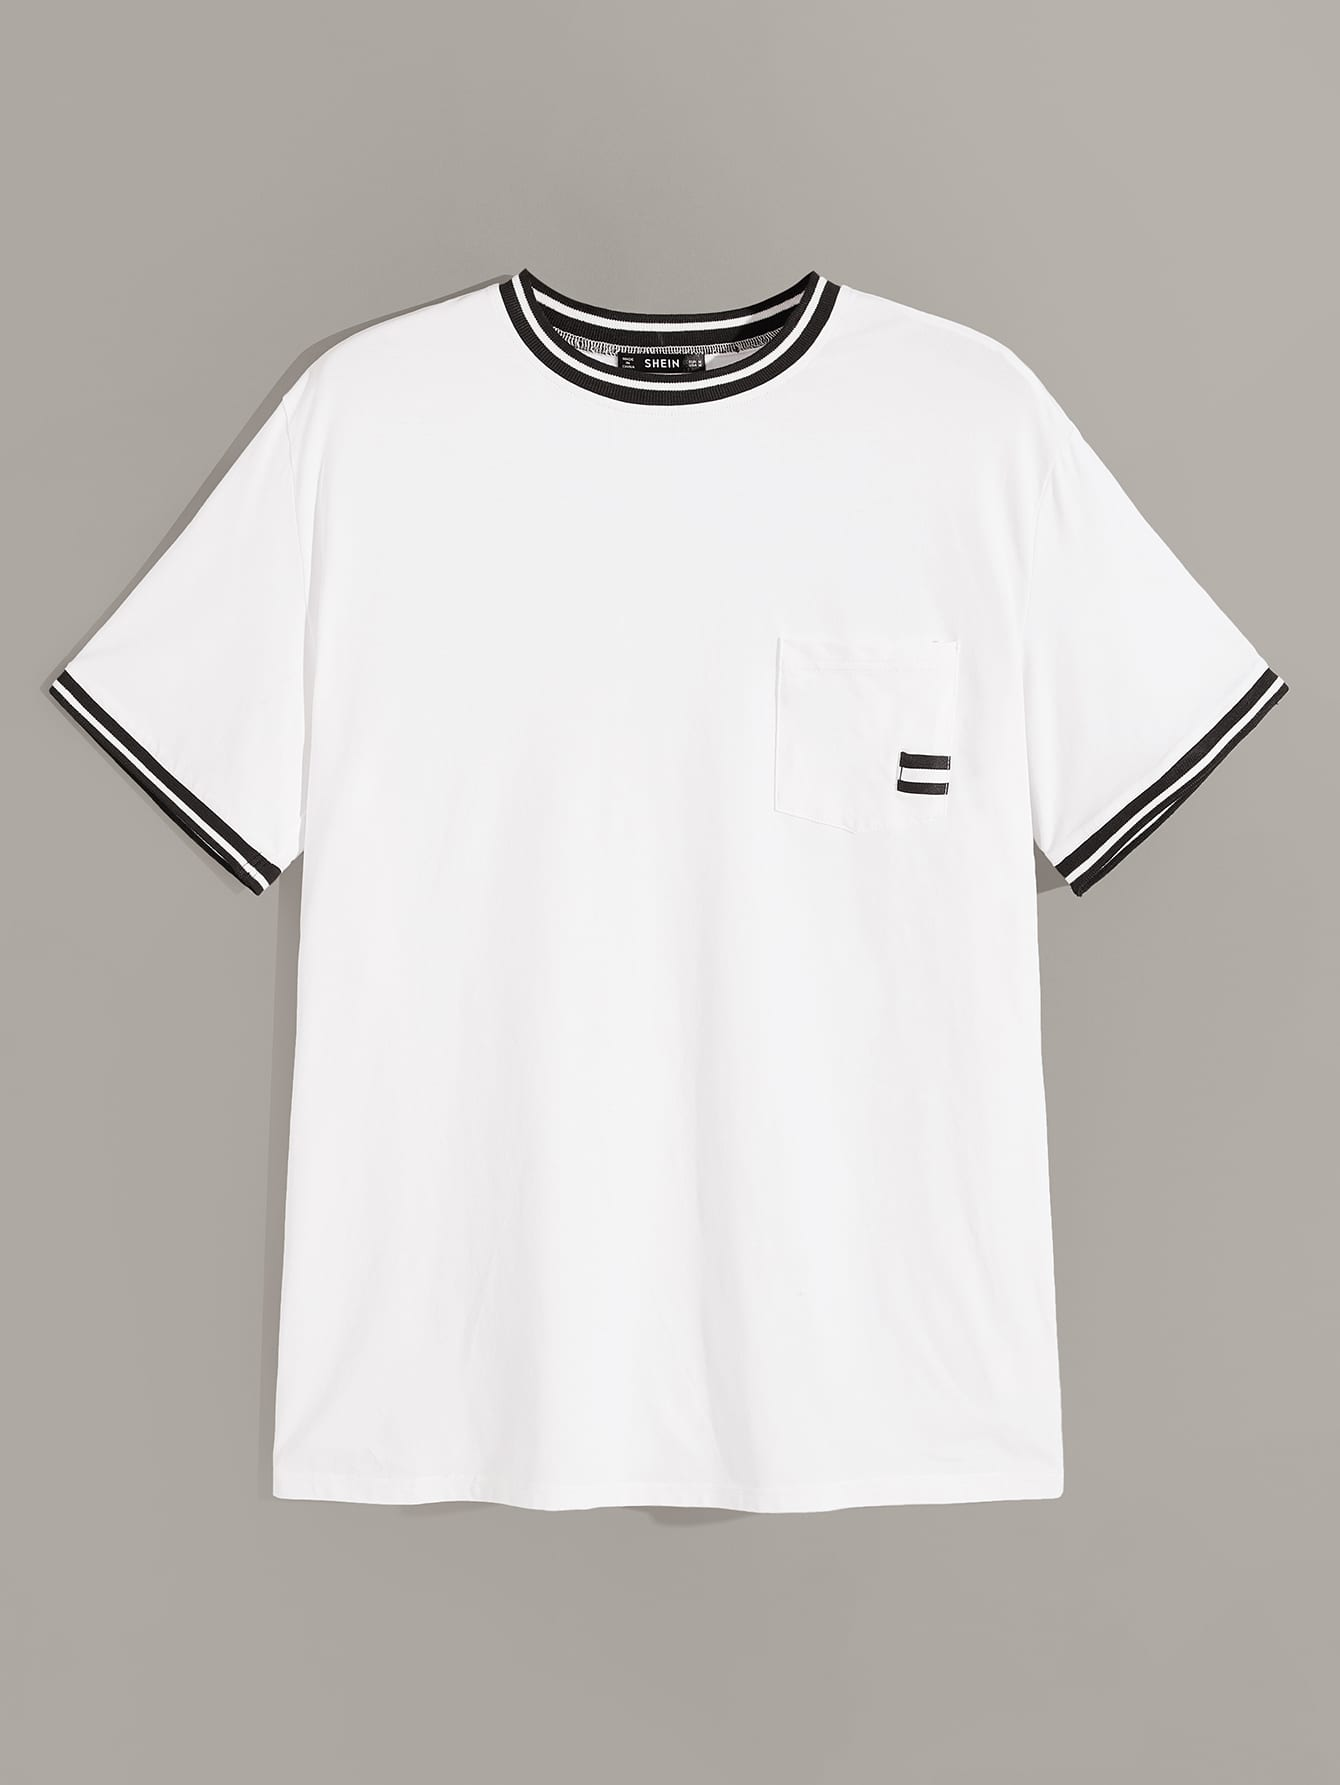 Фото - Мужская футболка с полосками и карманом от SheIn белого цвета